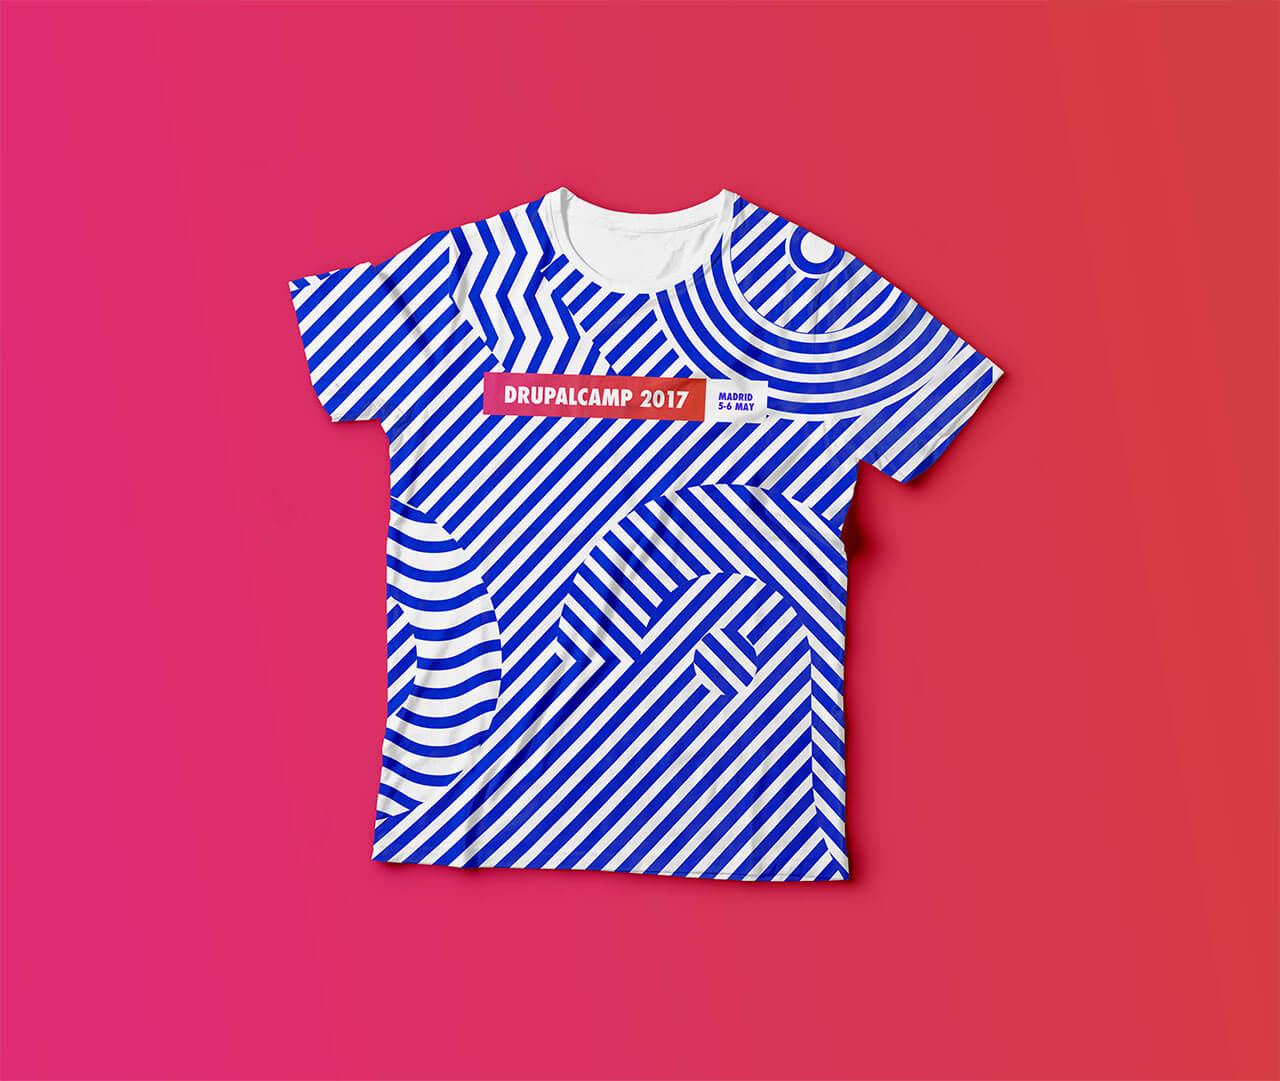 Camiseta para la Drupal Camp 2017